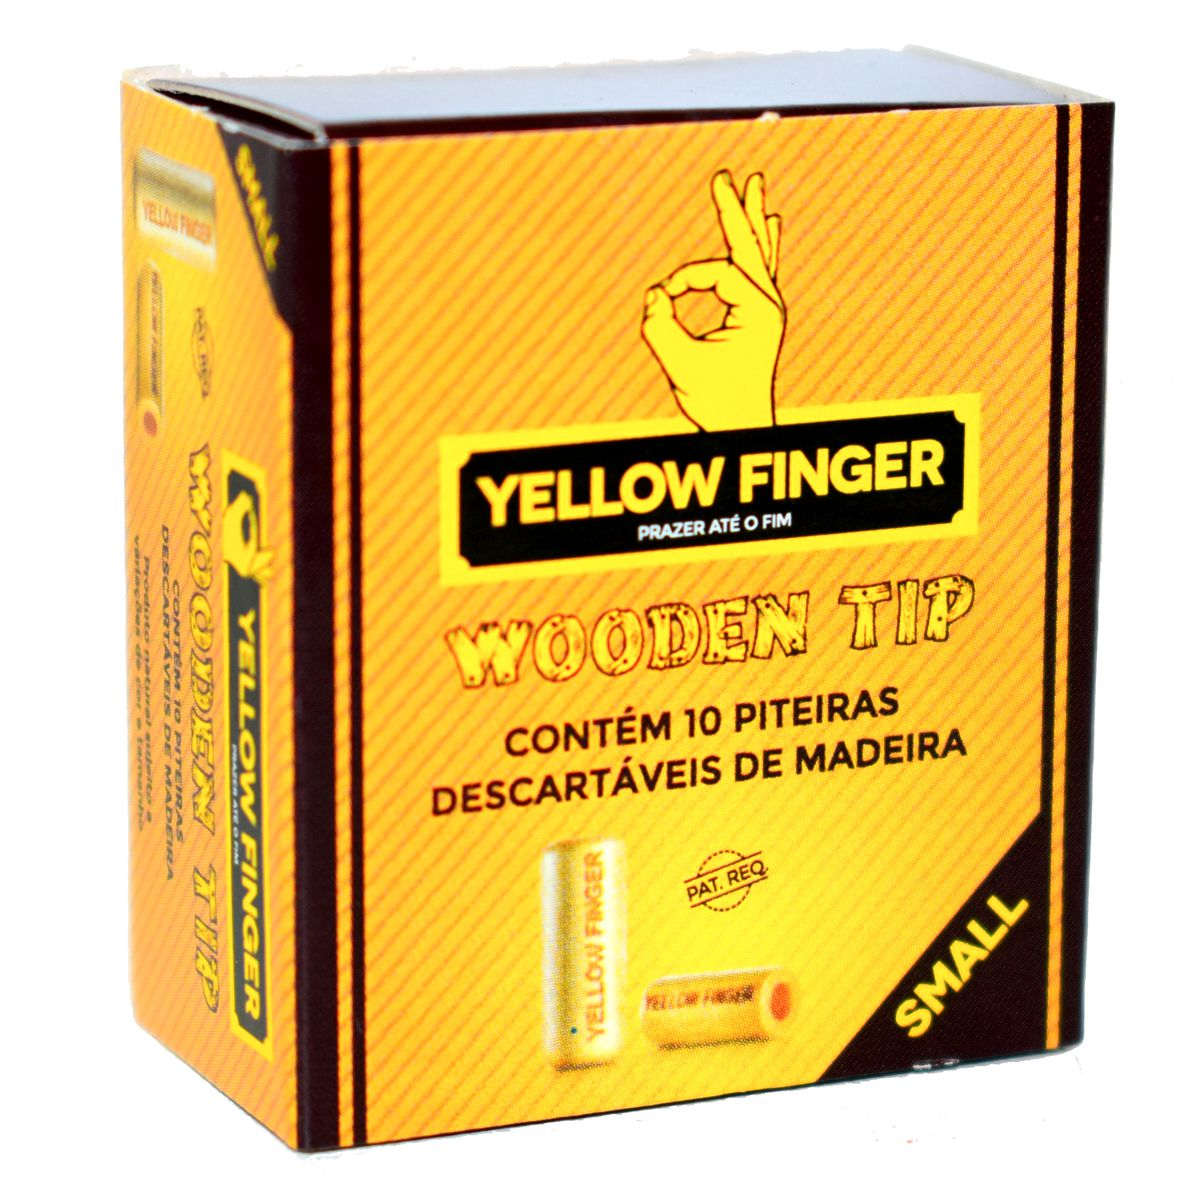 filtros yellow finger small precio tabaqueria